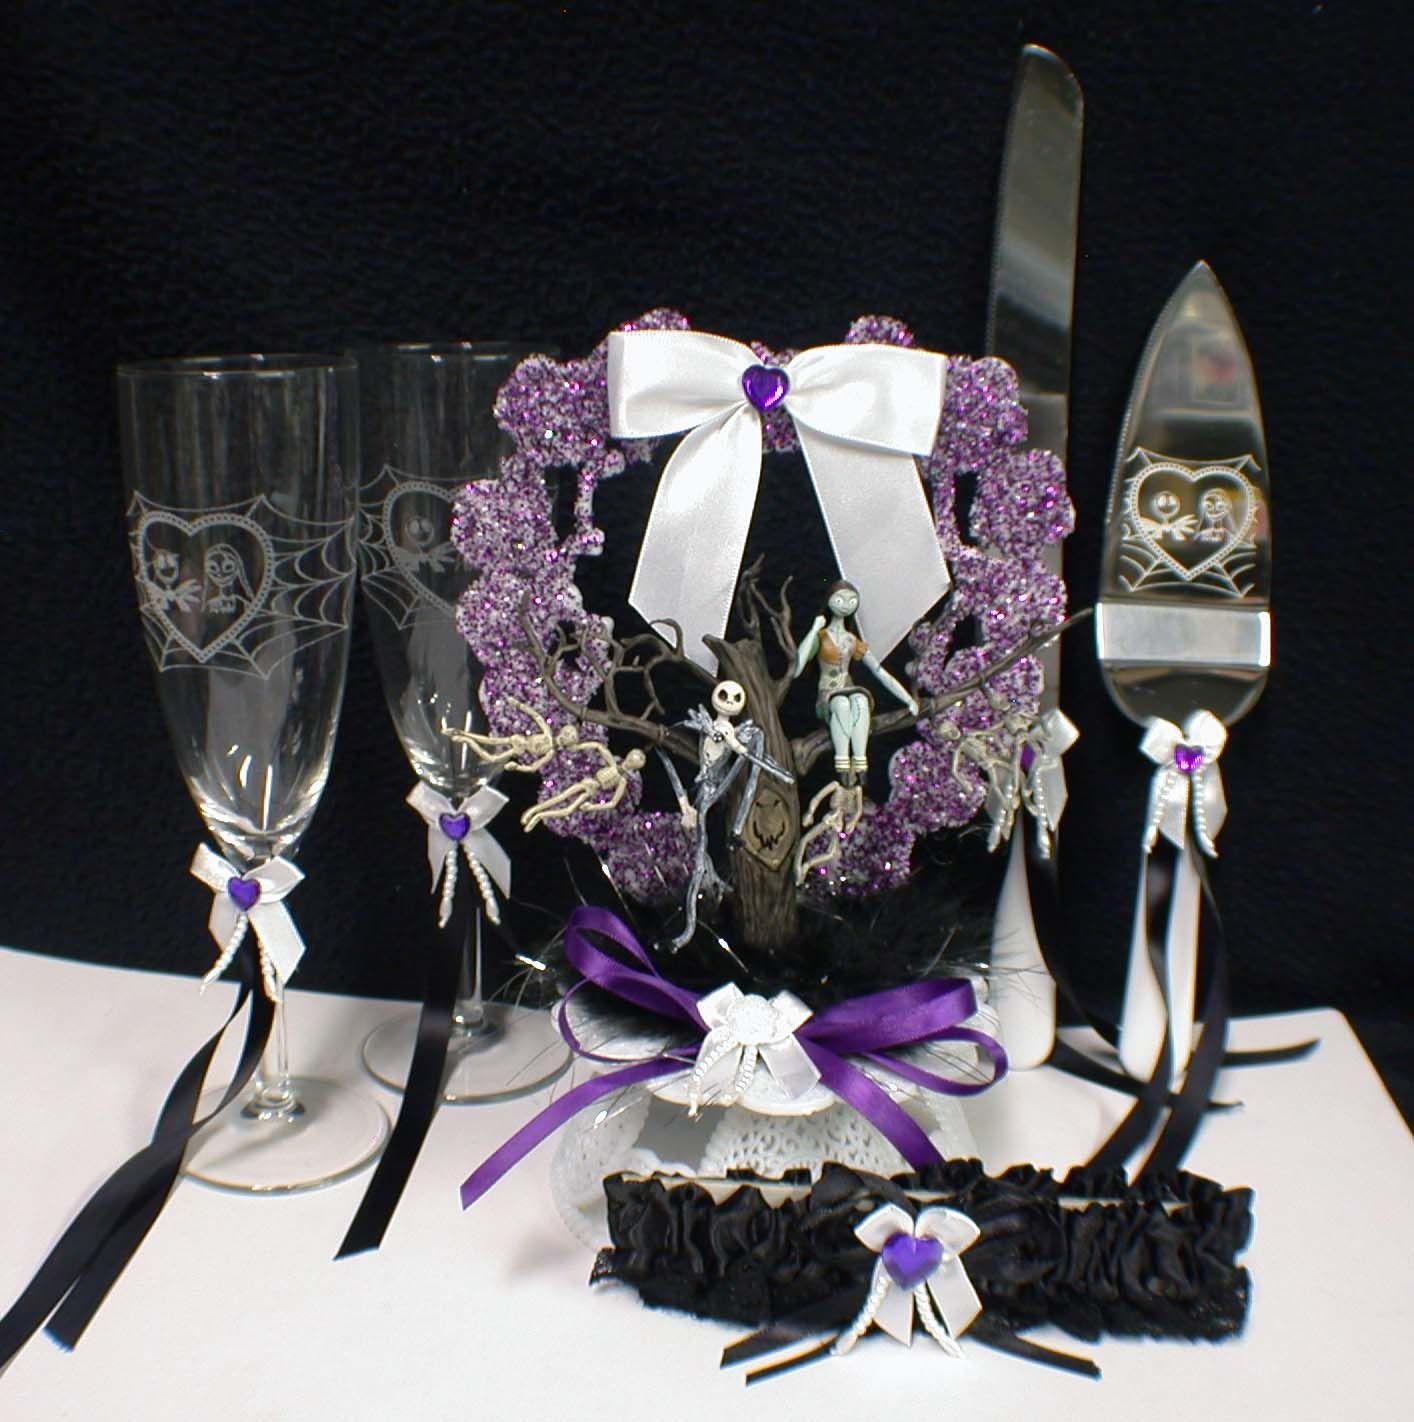 Nightmare Before Christmas Wedding Dress Ideas - 25 Breathtaking ...